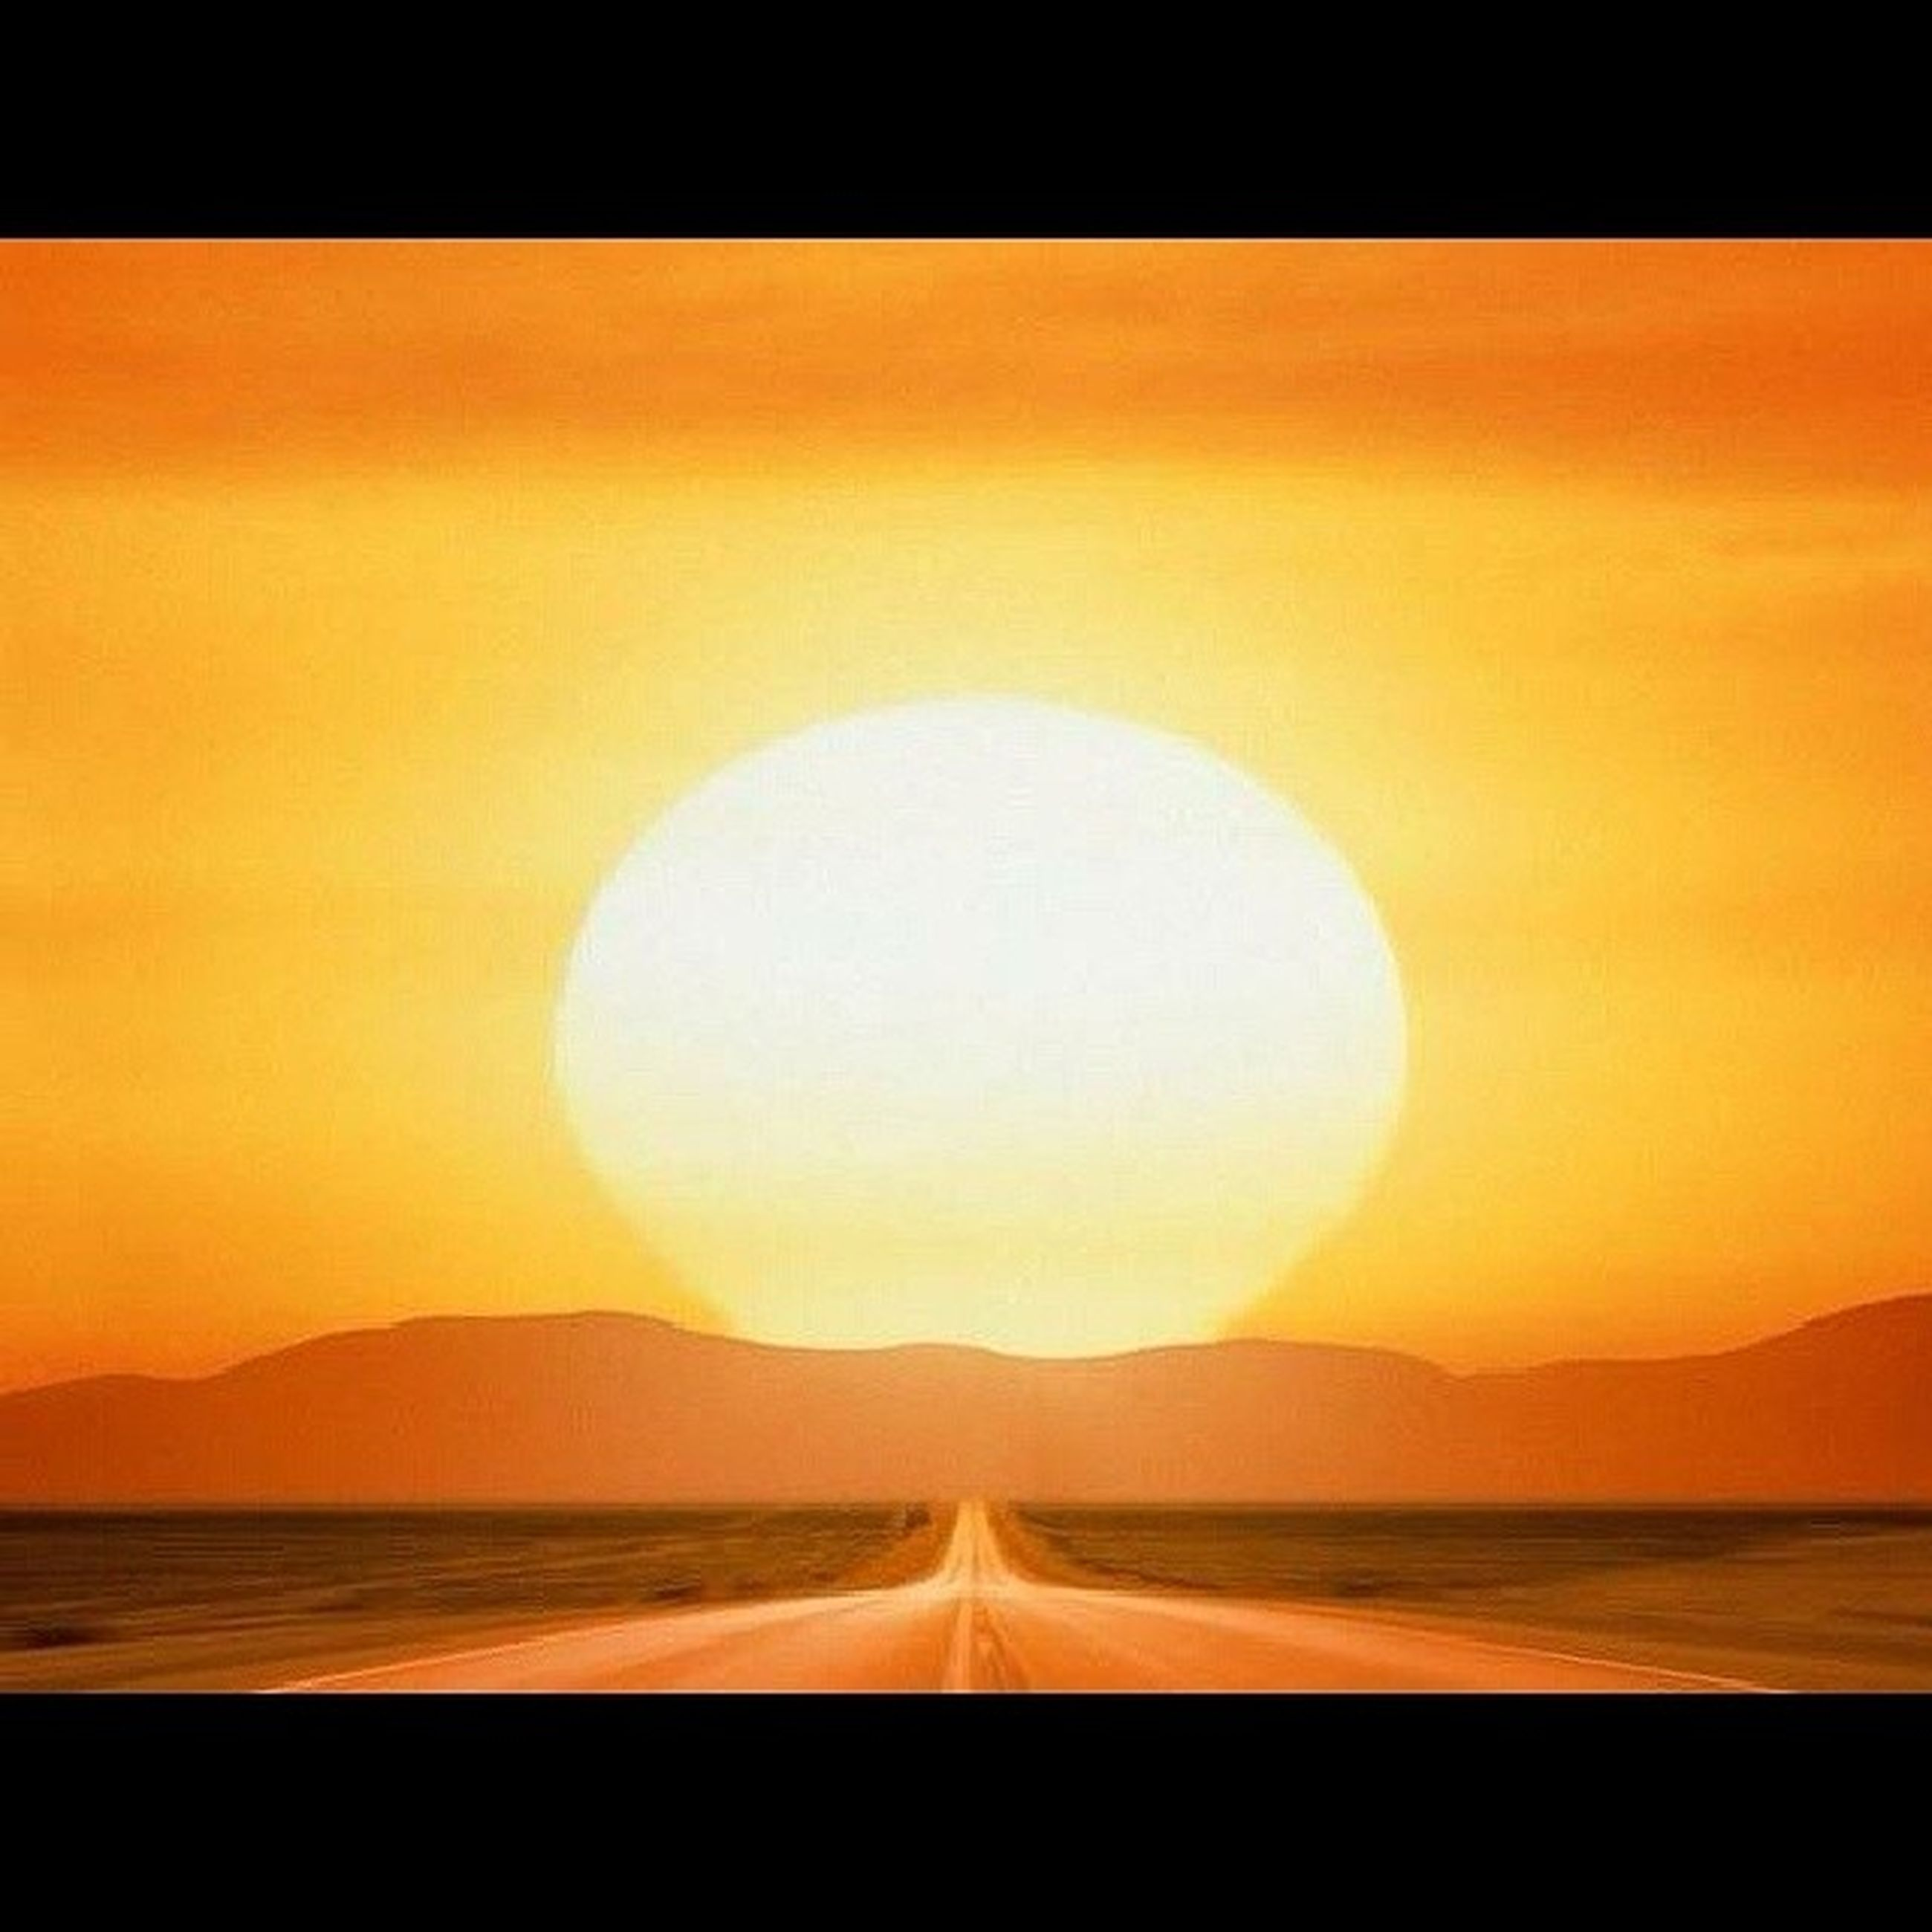 sunset, scenics, water, tranquil scene, mountain, beauty in nature, sea, tranquility, orange color, sun, idyllic, nature, reflection, sky, transportation, mountain range, non-urban scene, no people, horizon over water, remote